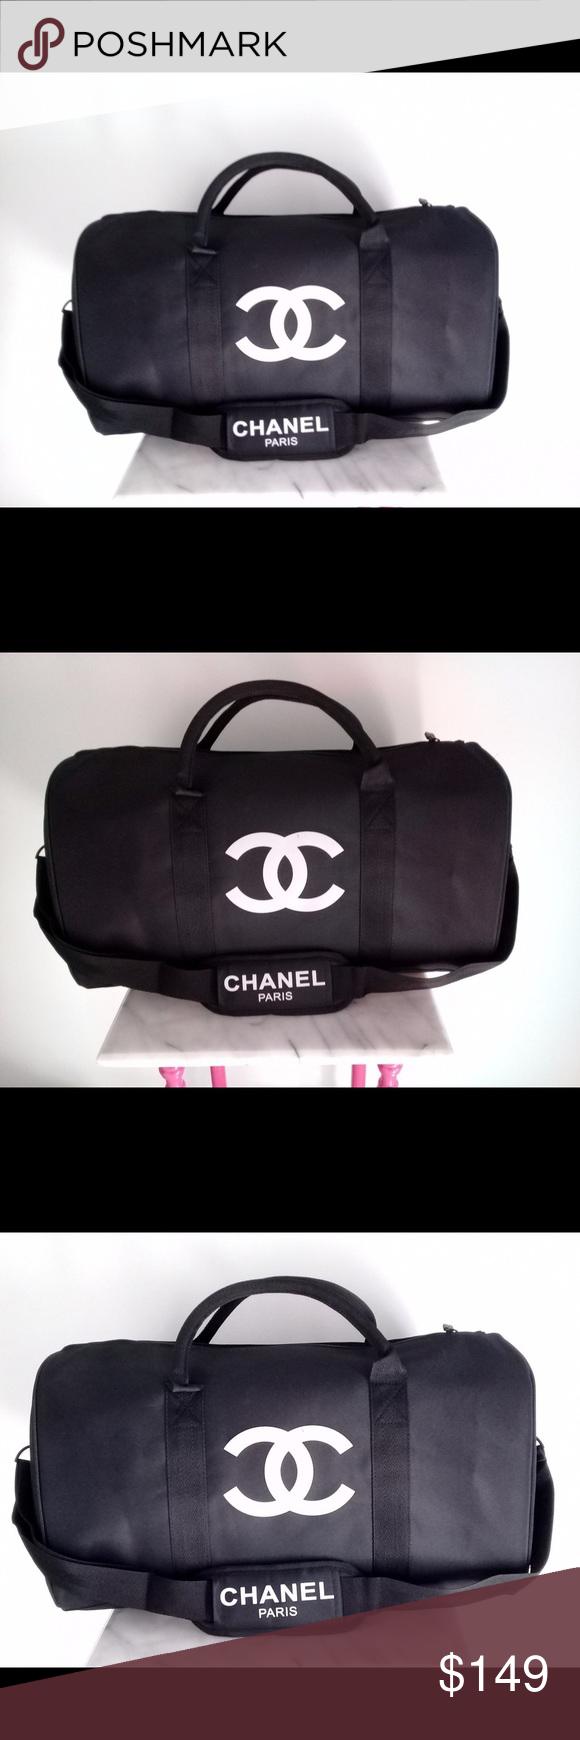 fc8b48f1a004 Chanel vip gift bag travel bag gym bag duffle bag Authentic Chanel vip gift  bag travel